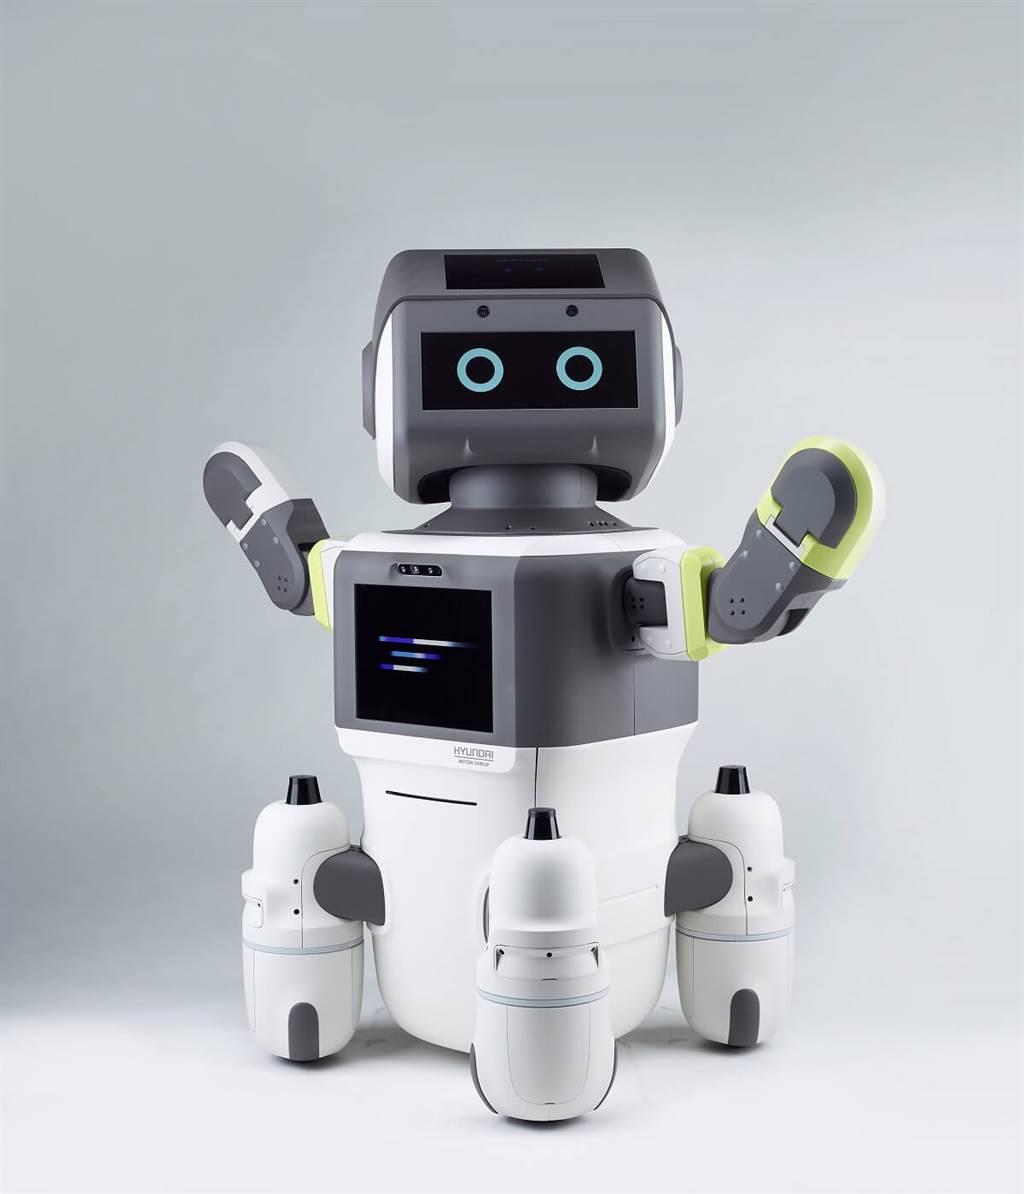 Hyundai汽車集團推出人形機器人「DAL-e」用於客戶服務